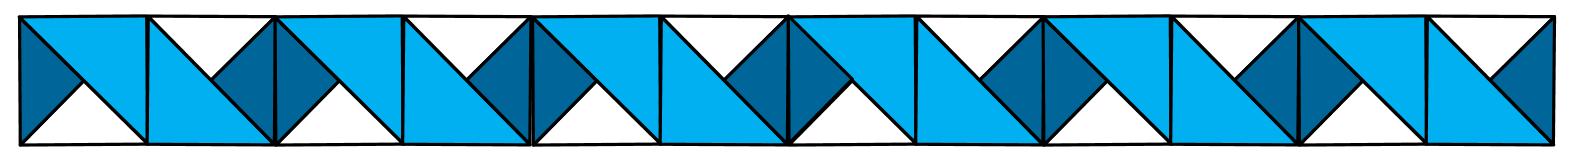 Diagram 5 - Rainbow Ribbons Quilt